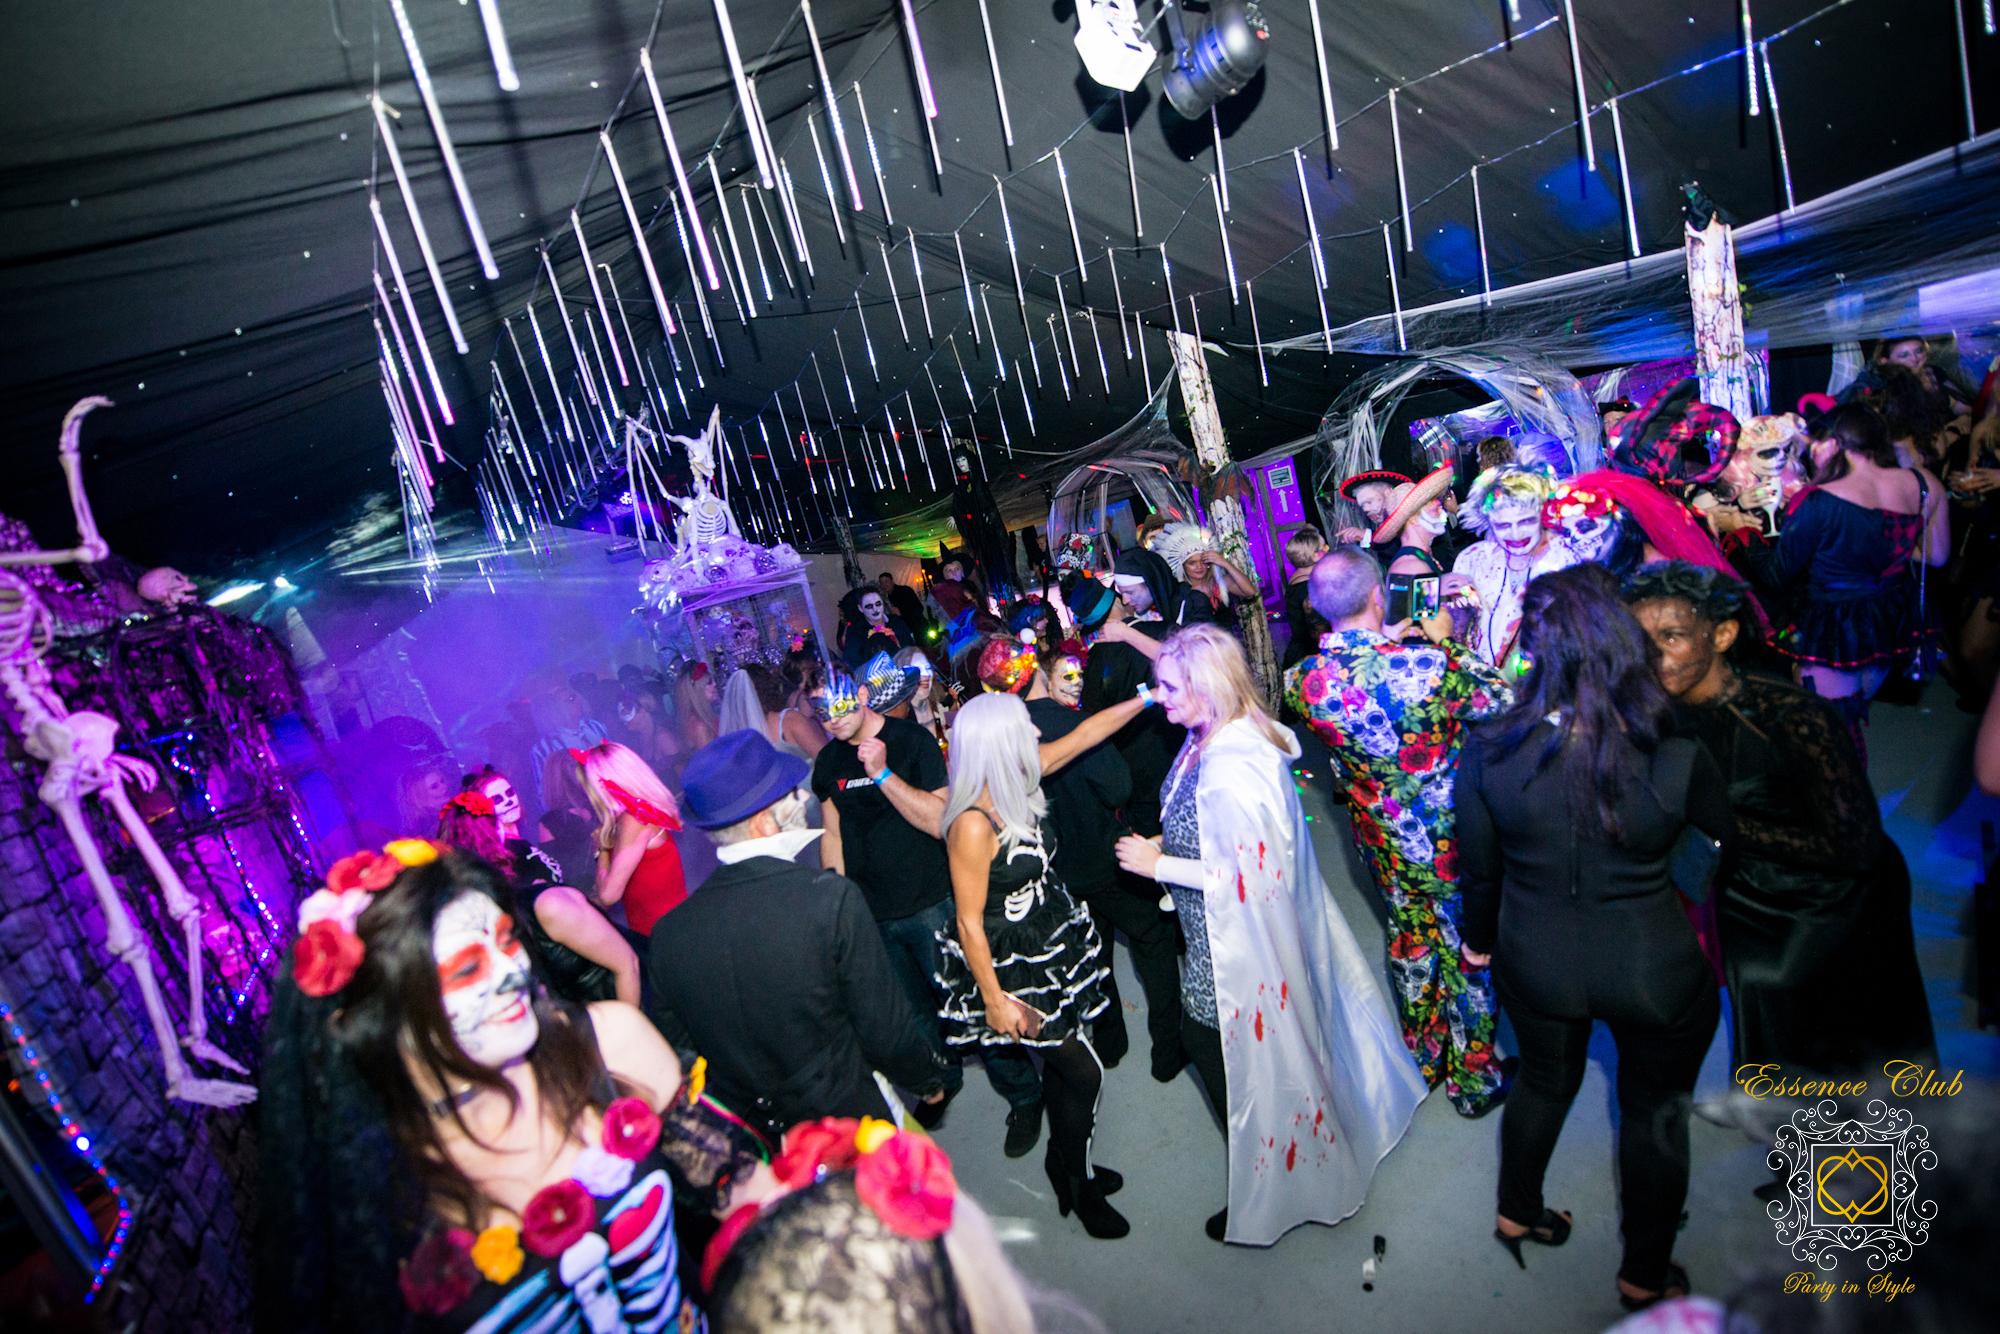 Essence Club Underworld themed party